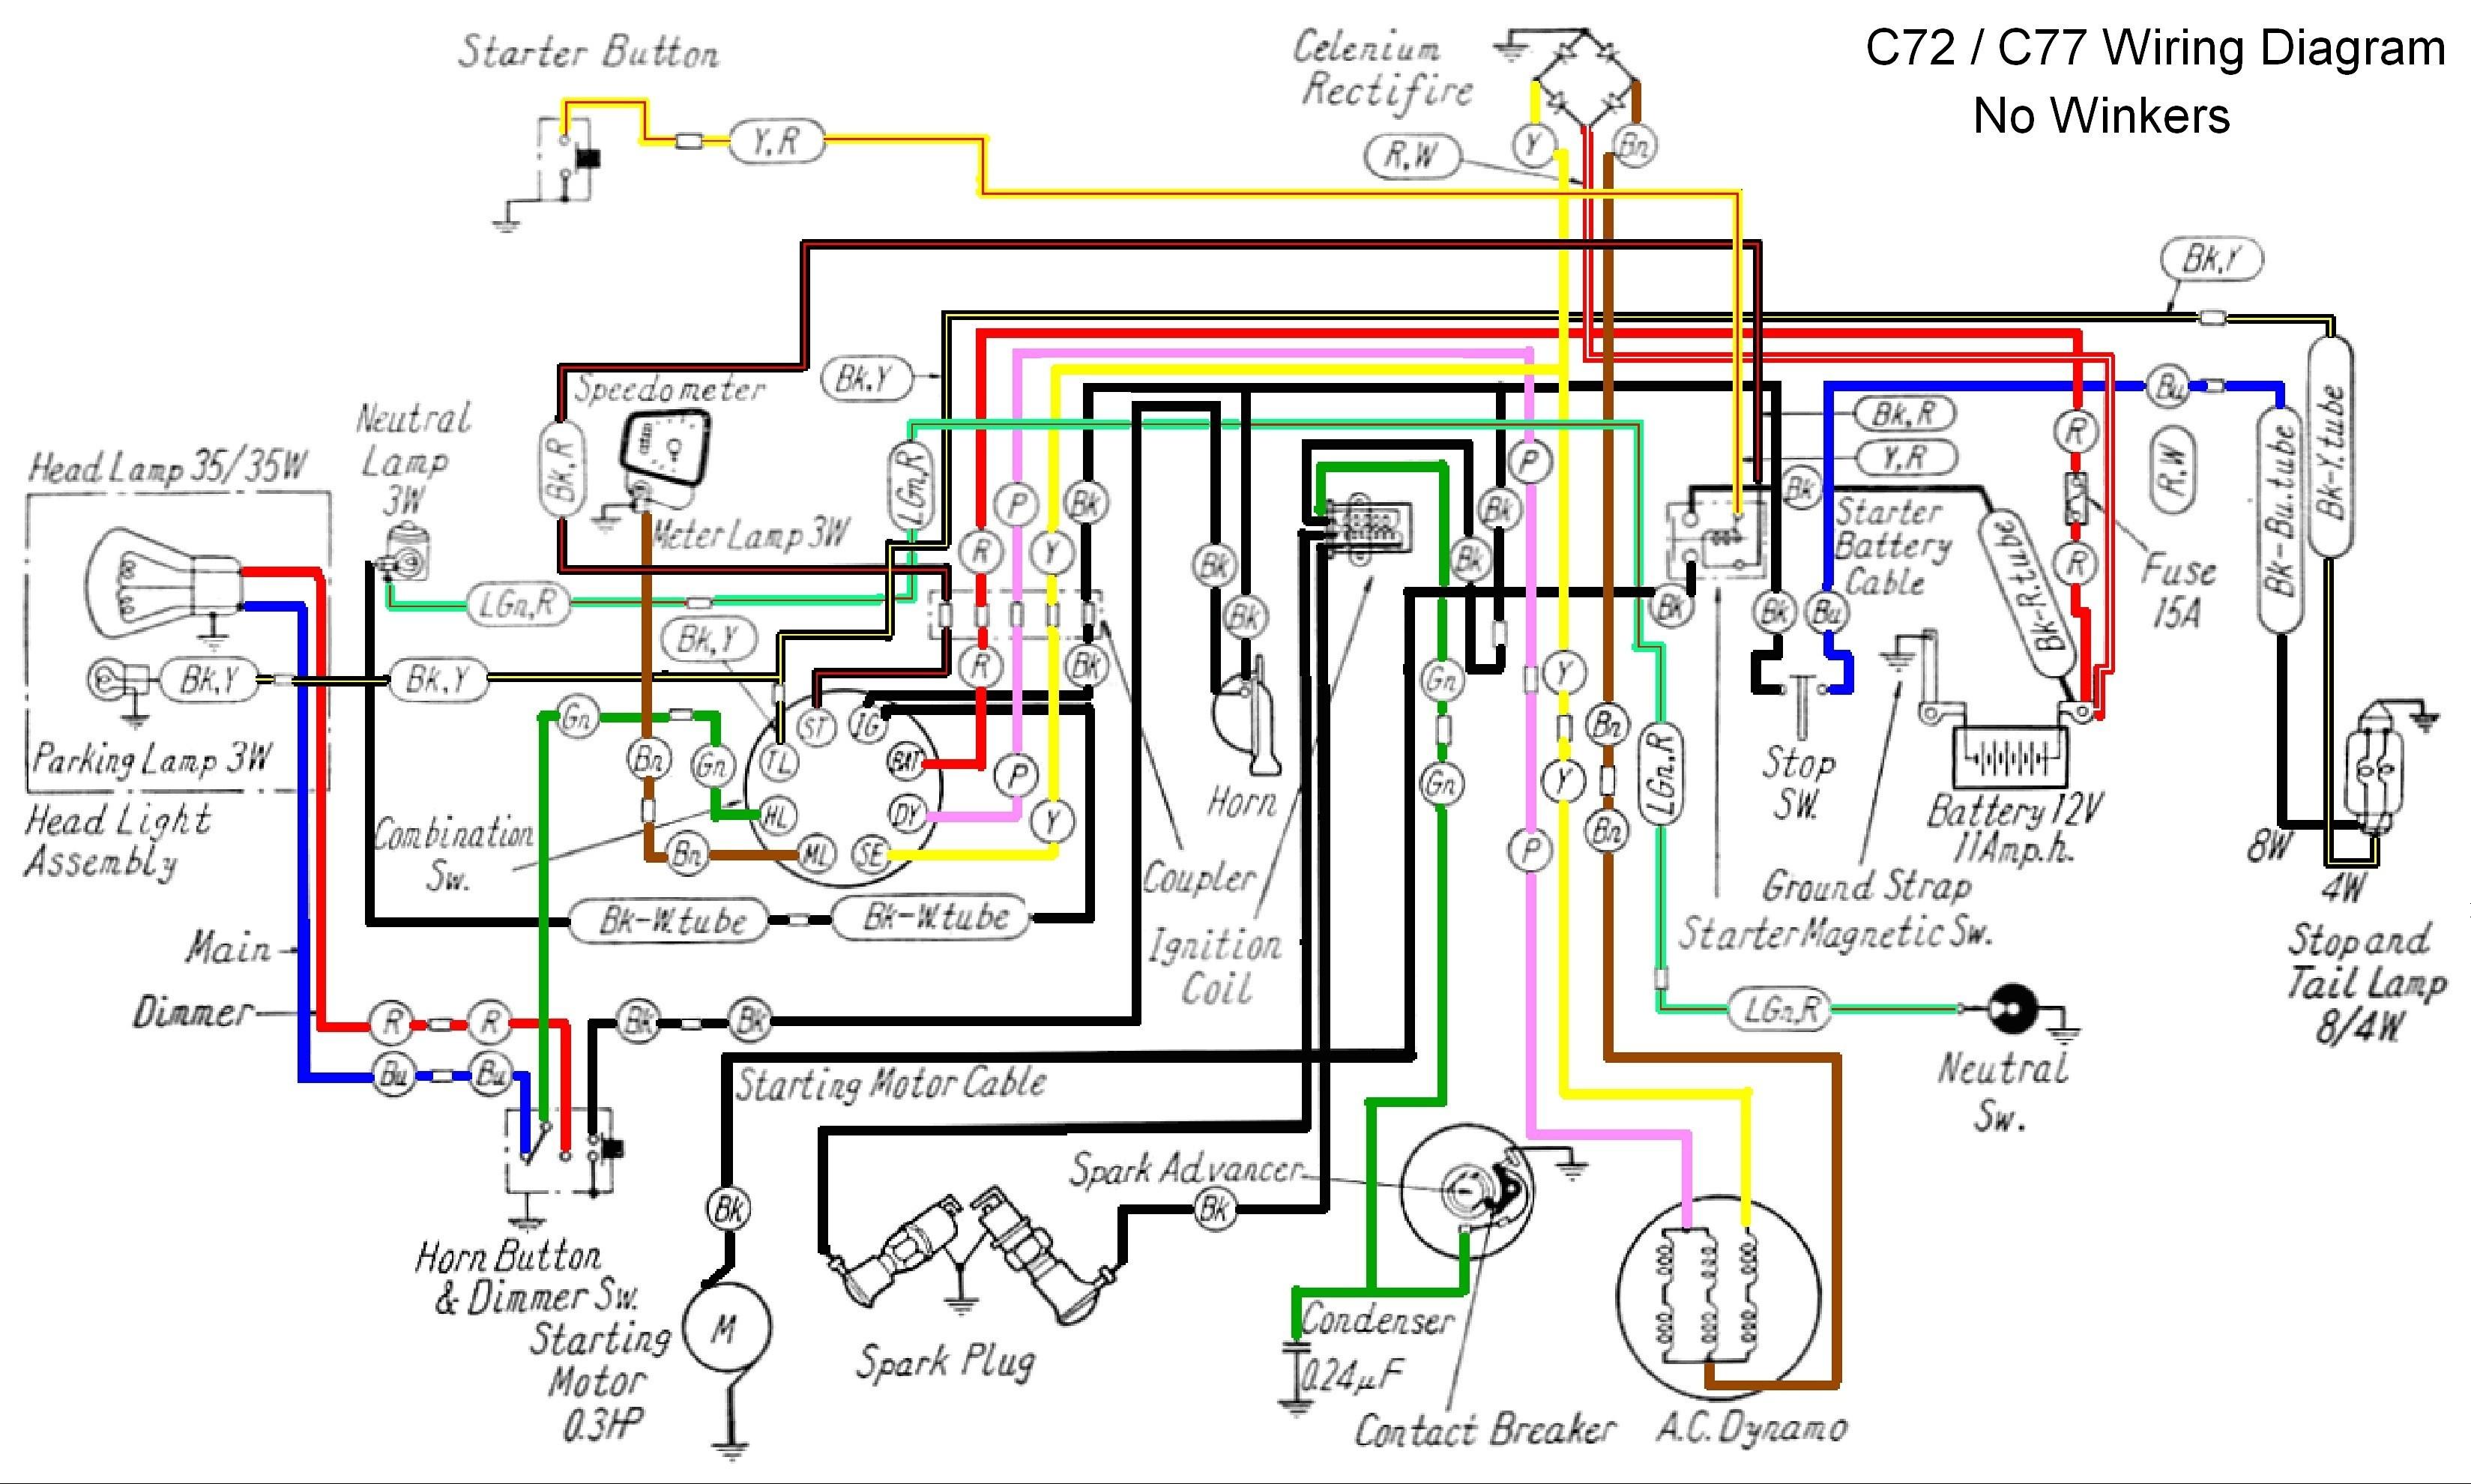 Honda Xr 125 Wiring Diagram Awesome Basic Motorcycle Wiring Diagram Gallery Everything You Of Honda Xr 125 Wiring Diagram